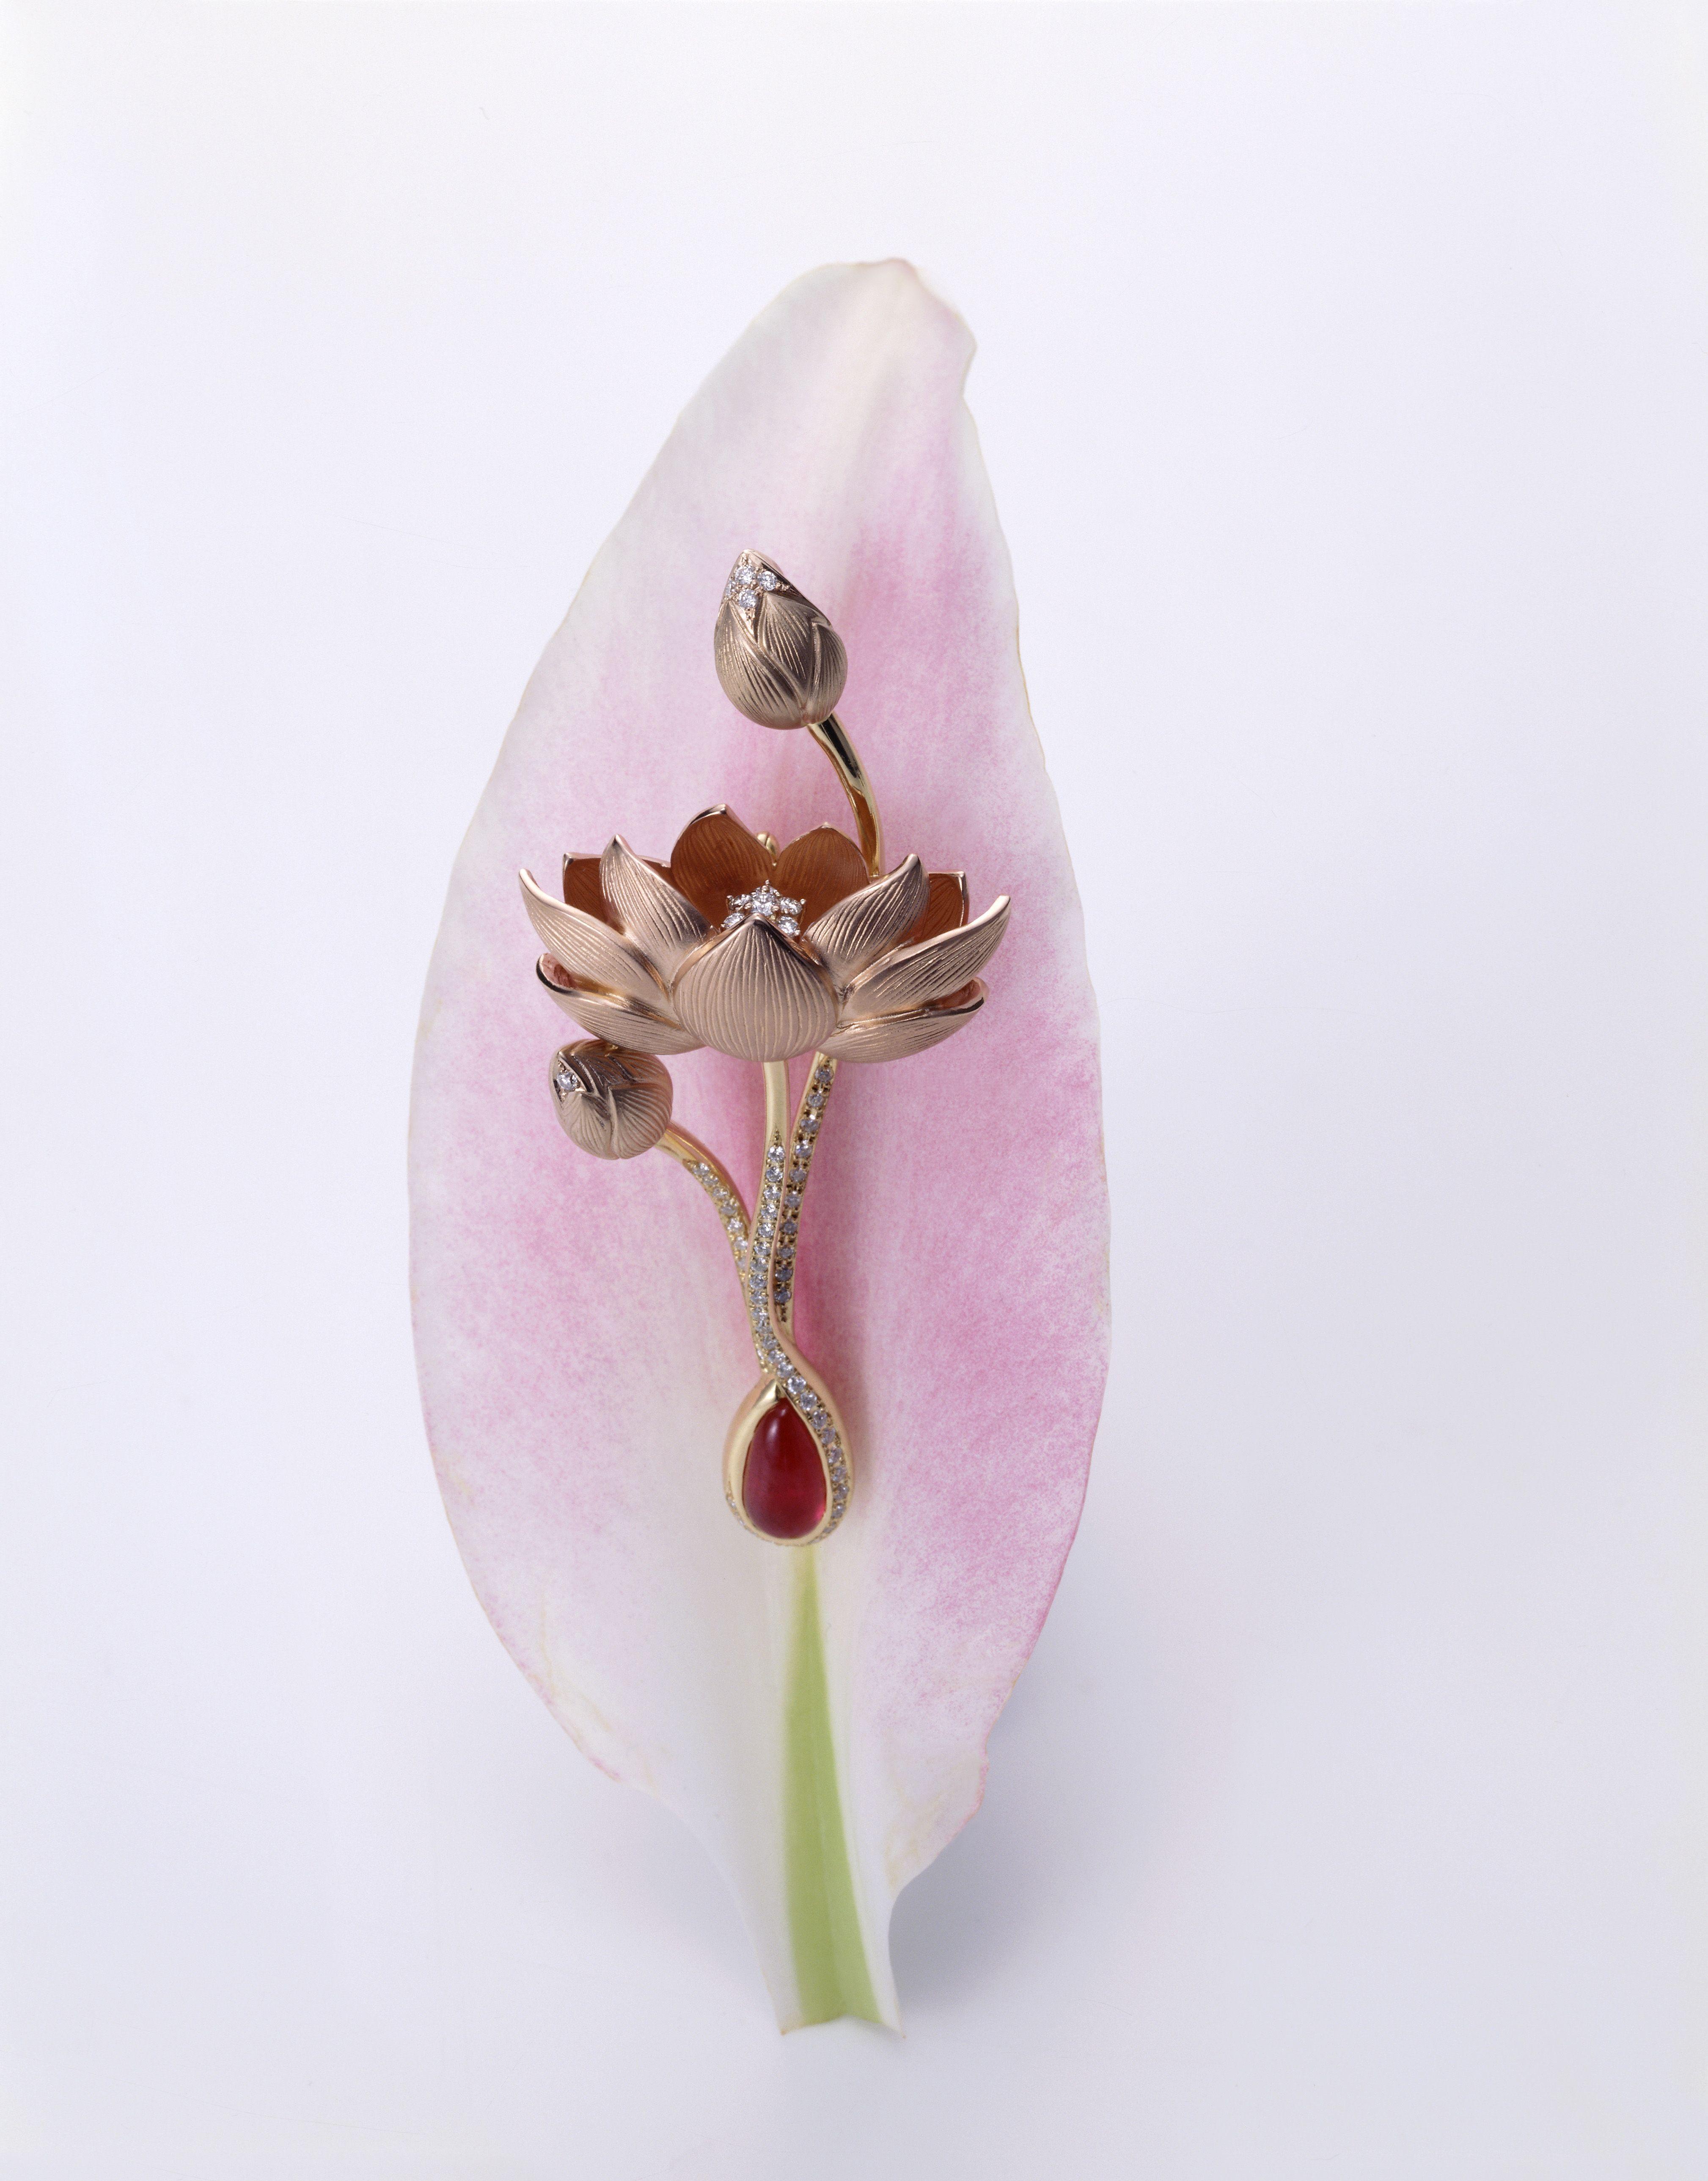 Broach With Lotus Flower Motif K Uno Jewellery Pinterest